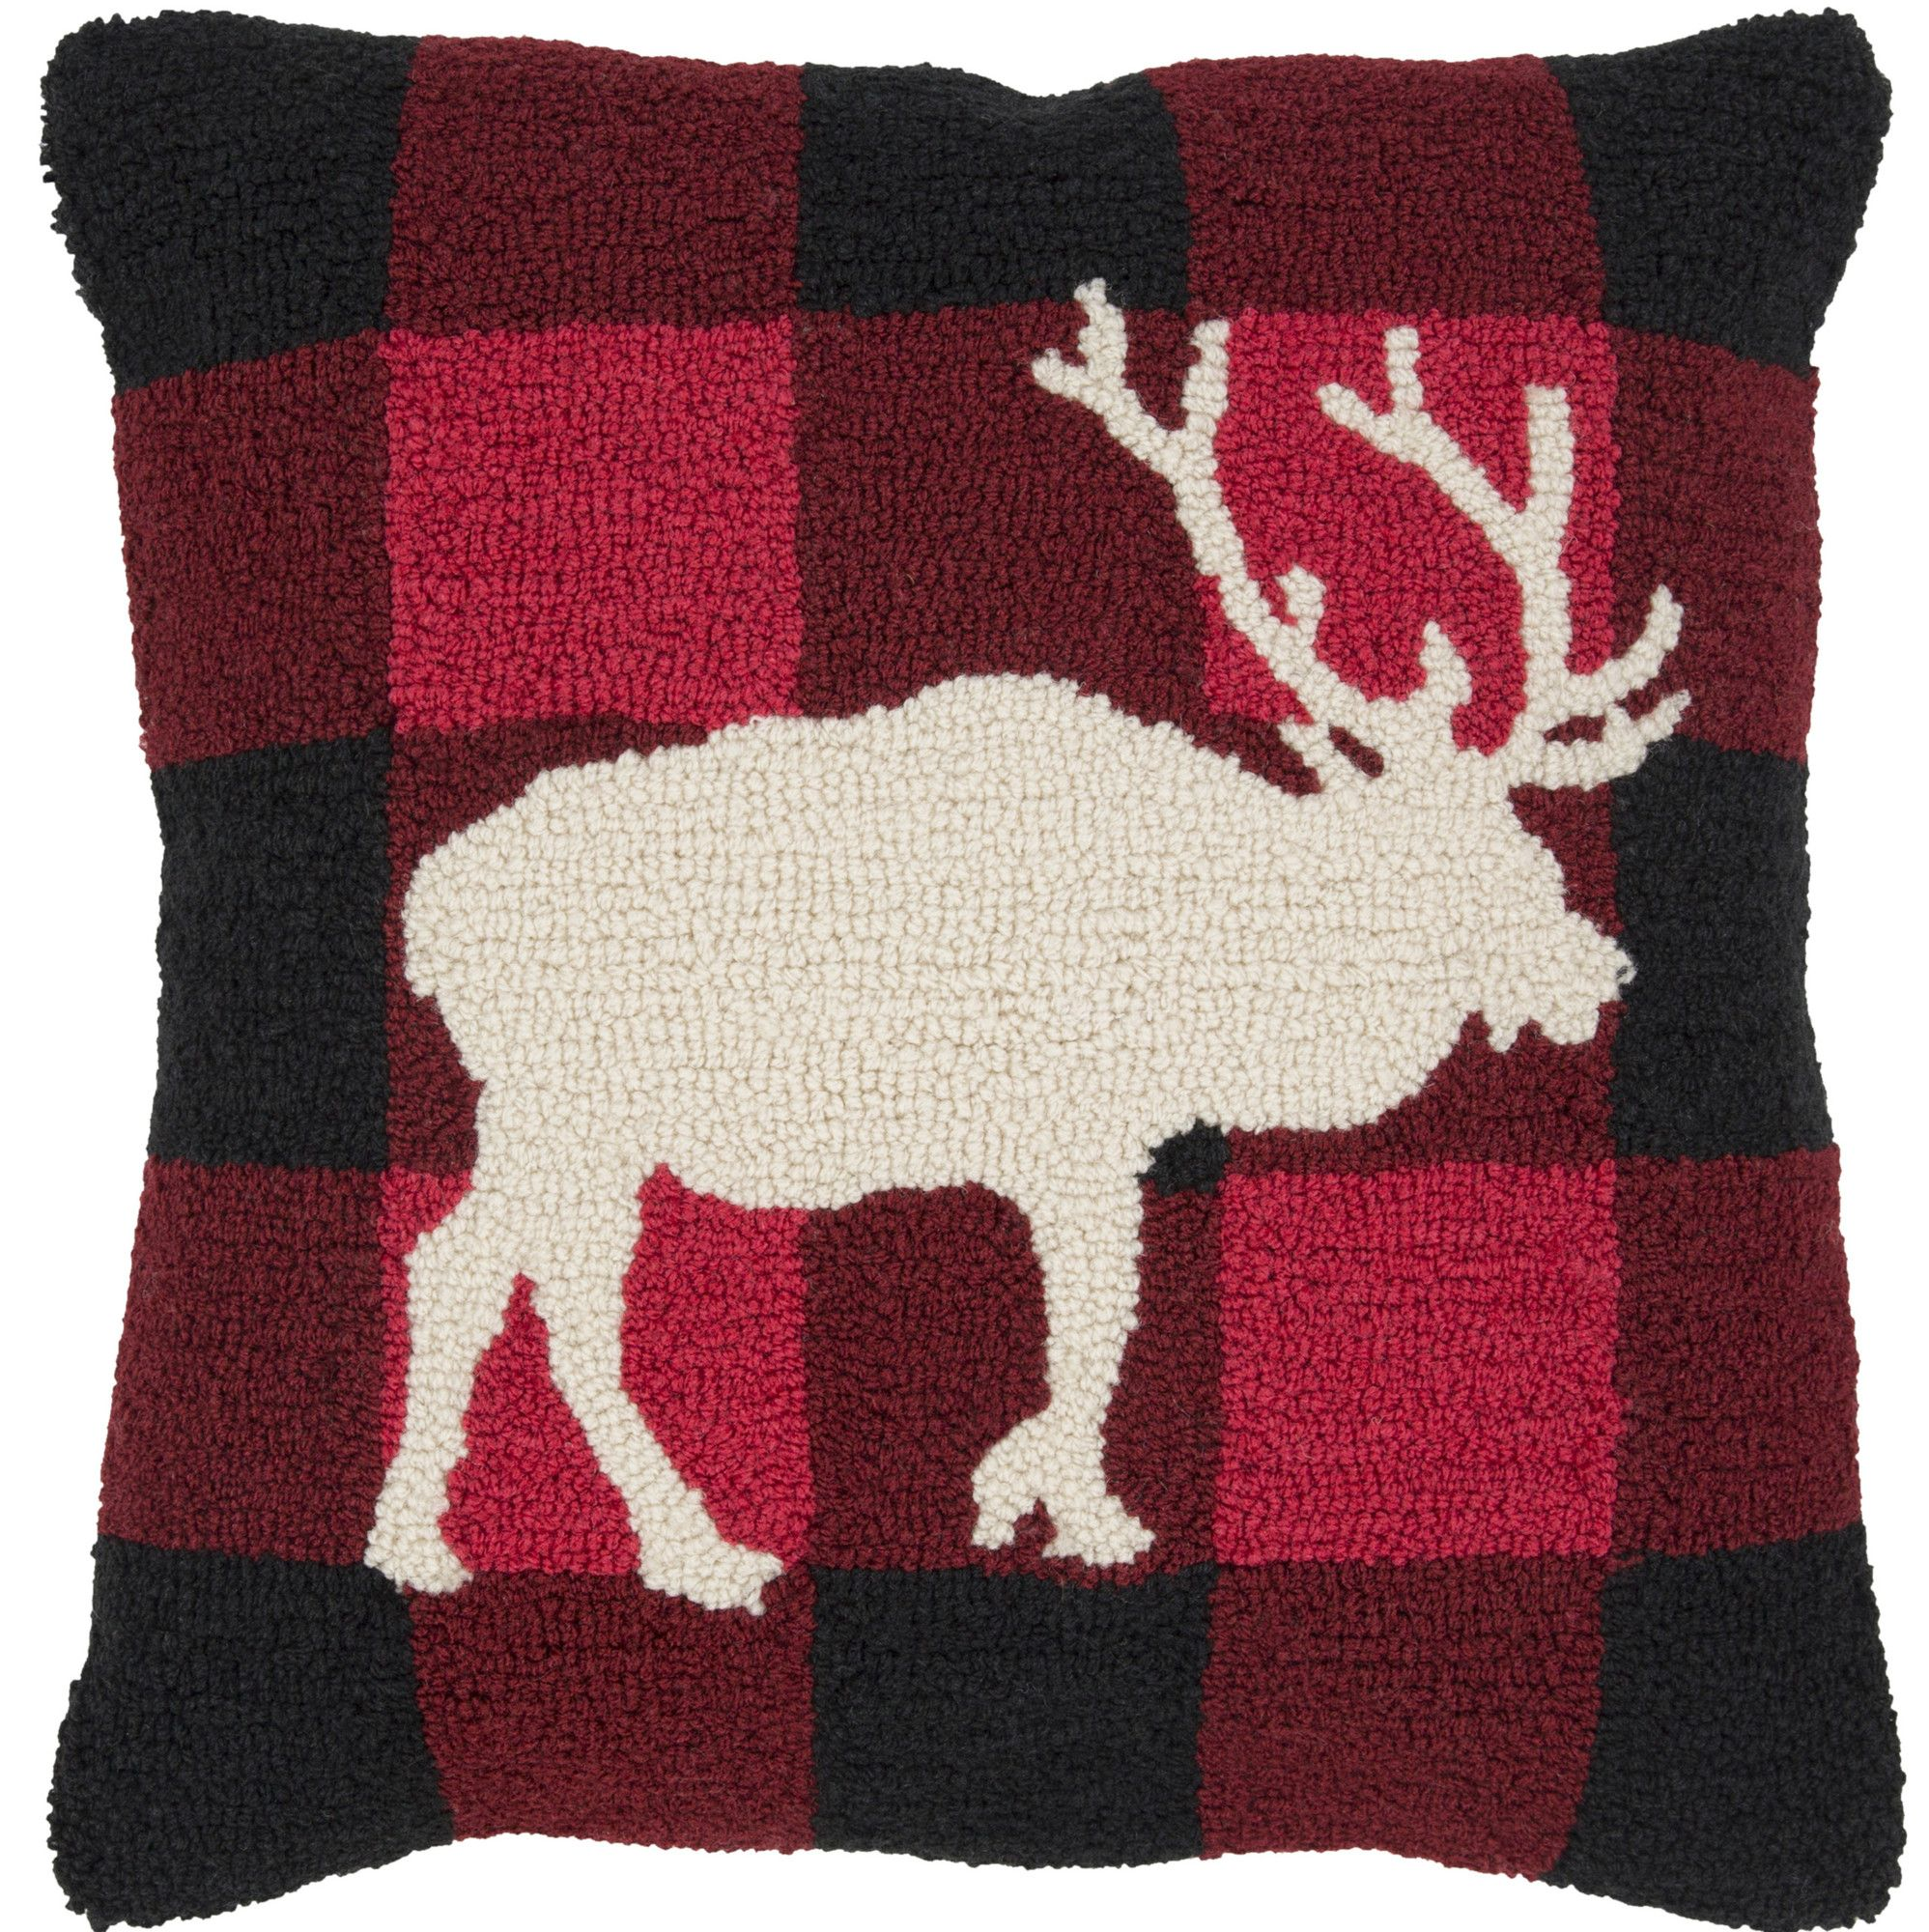 Eloise Pillow | Winter, Throw pillows and Pillows